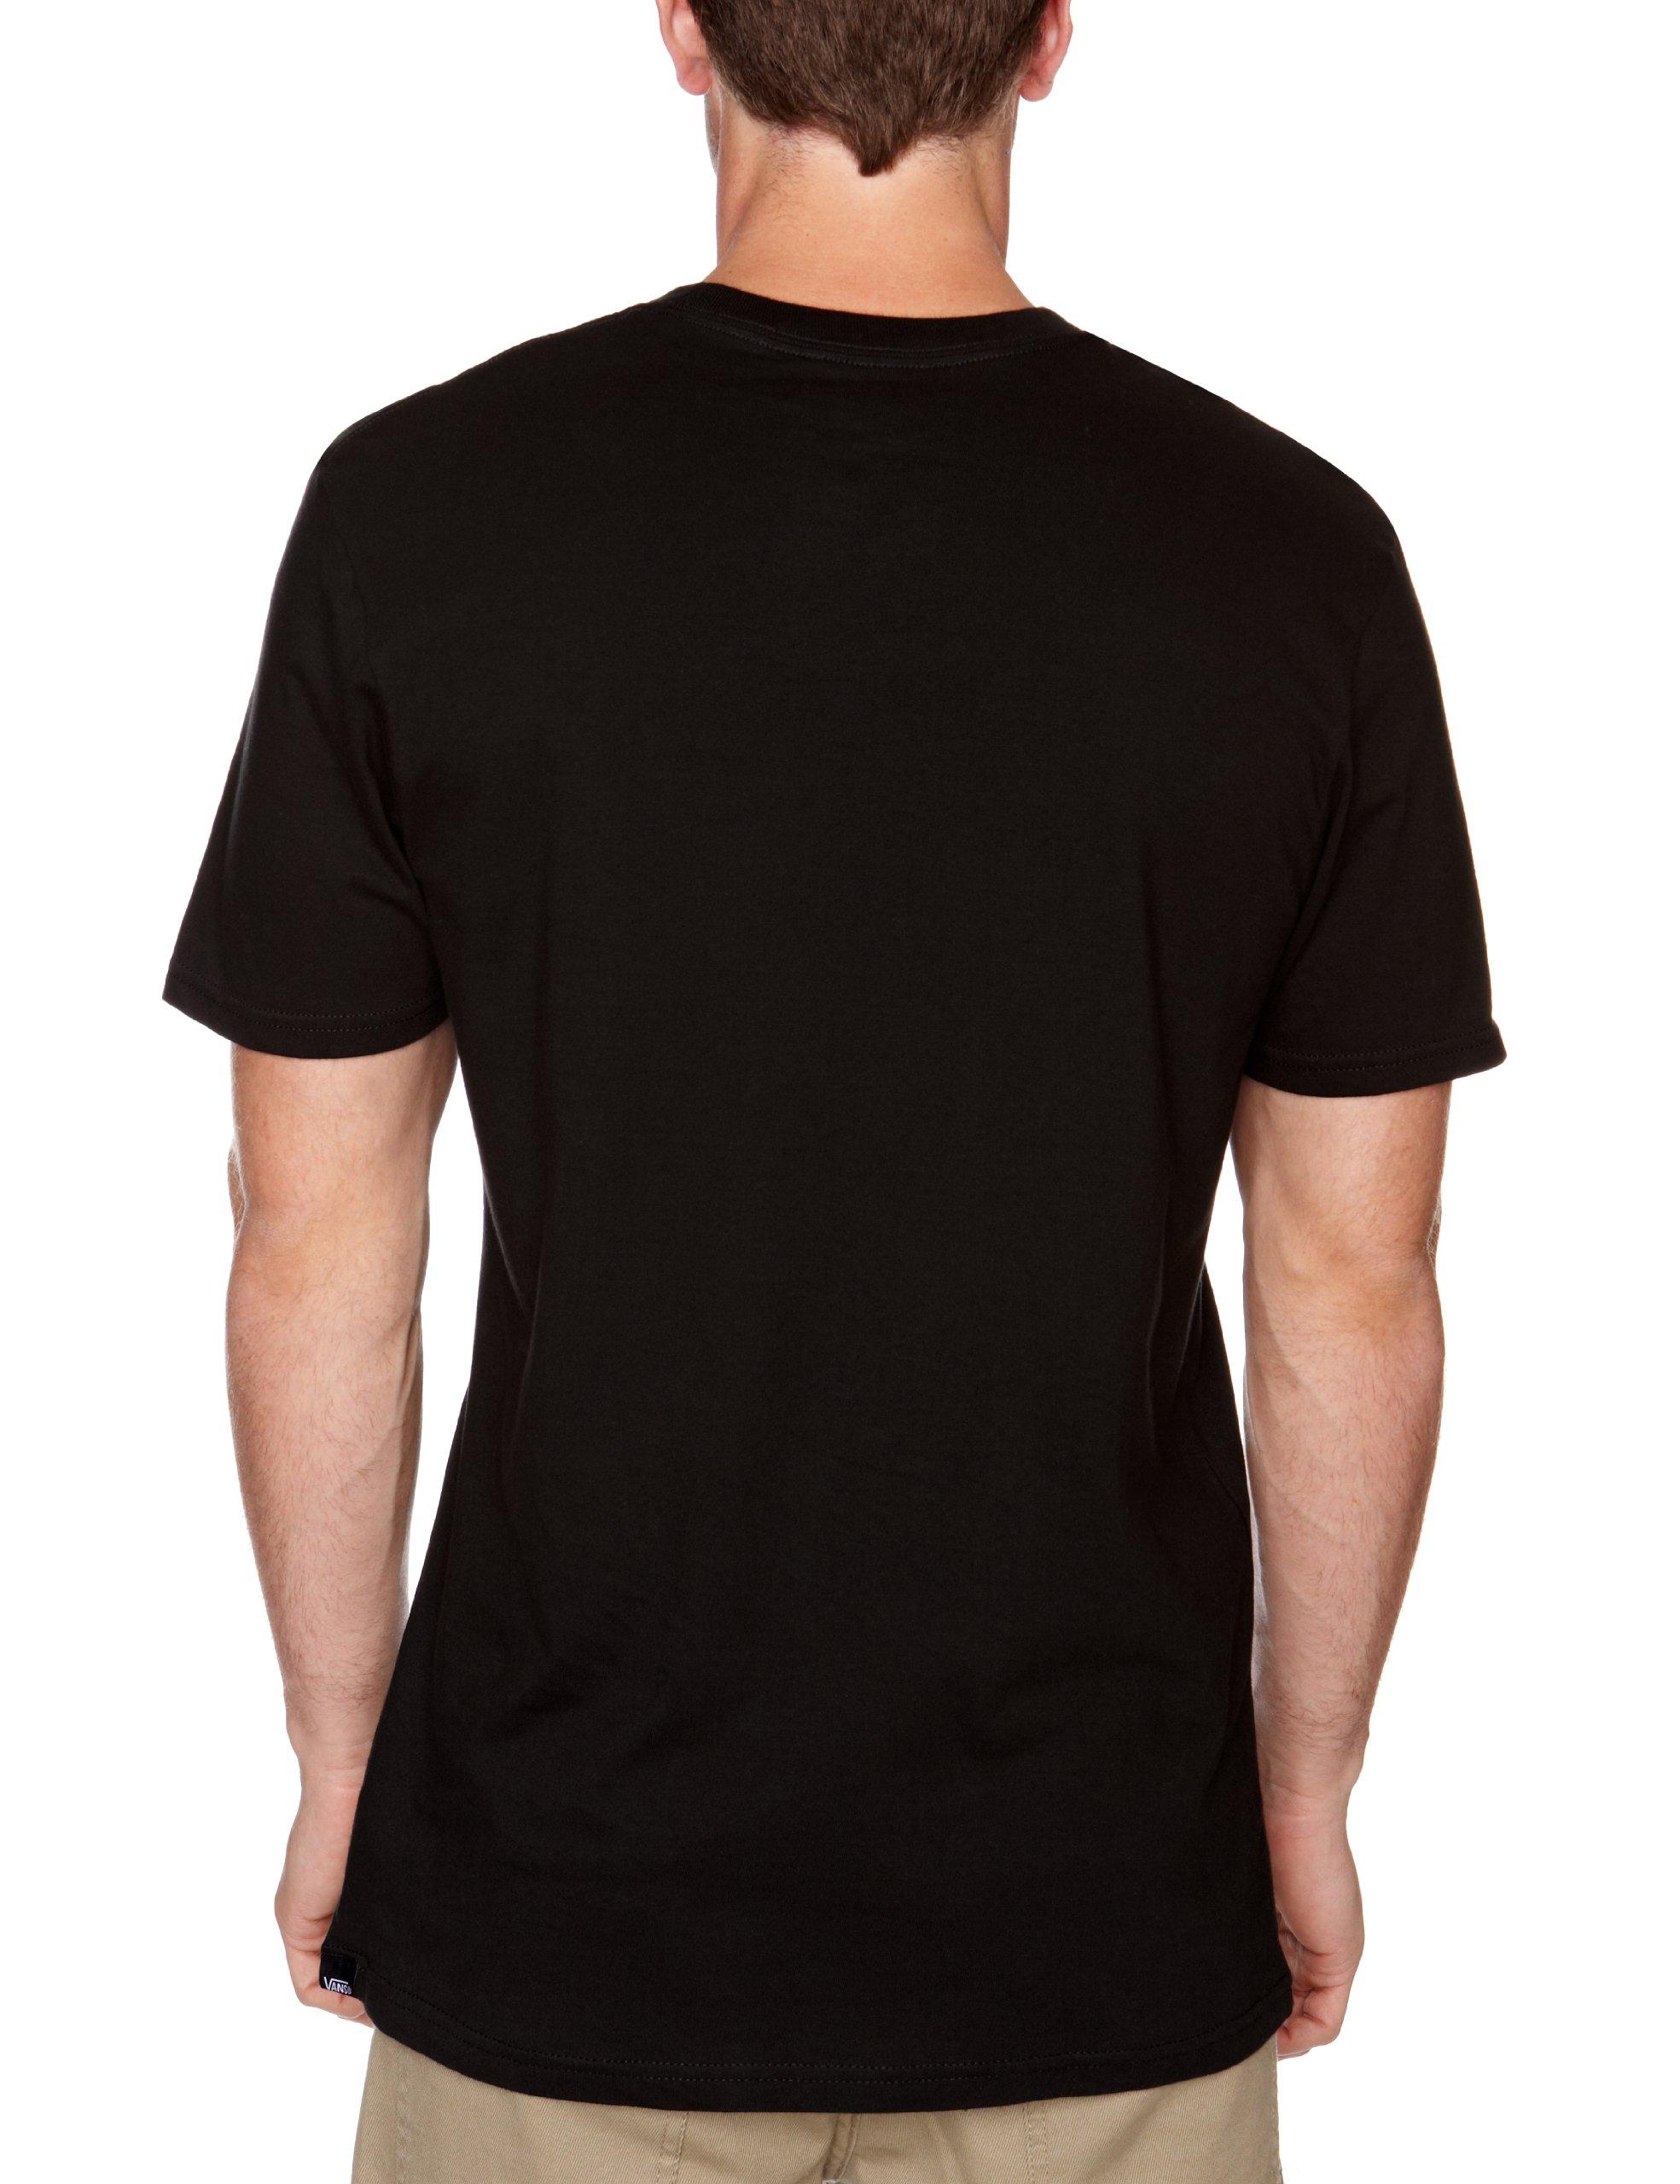 Vans OTW, T-shirt Uomo 3 spesavip